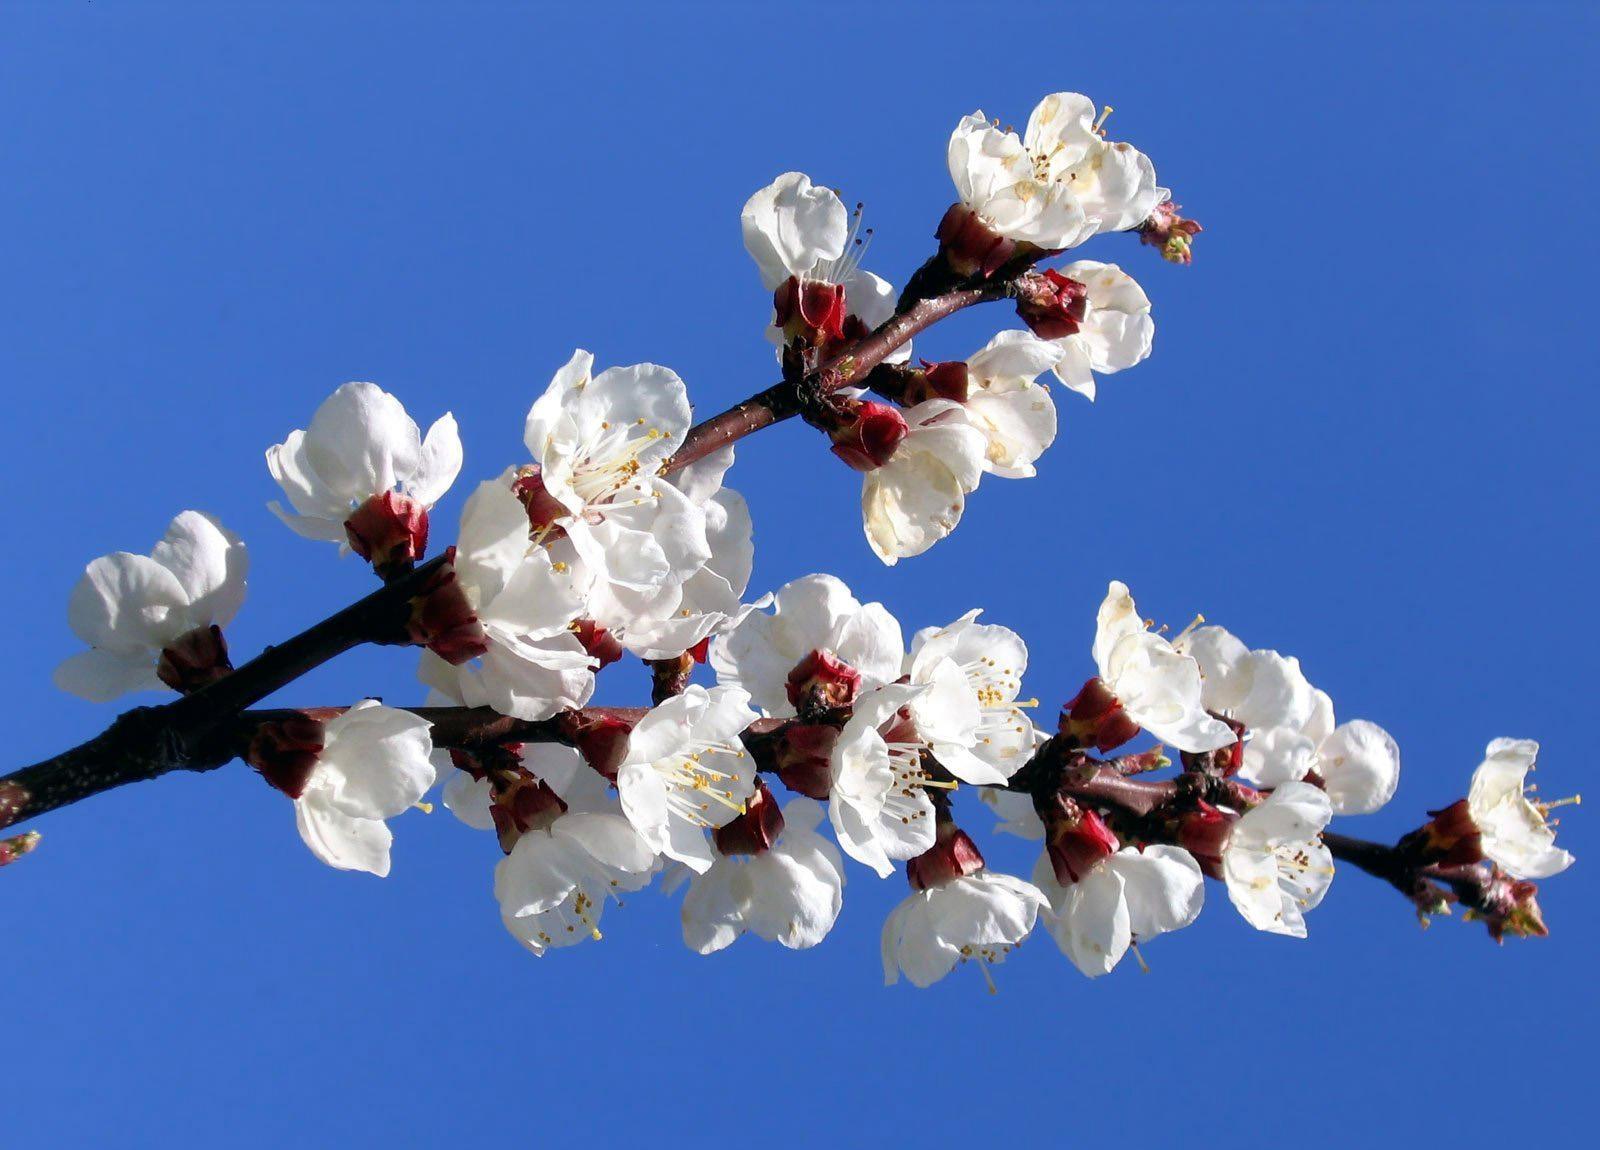 ветка цветущего дерева картинки